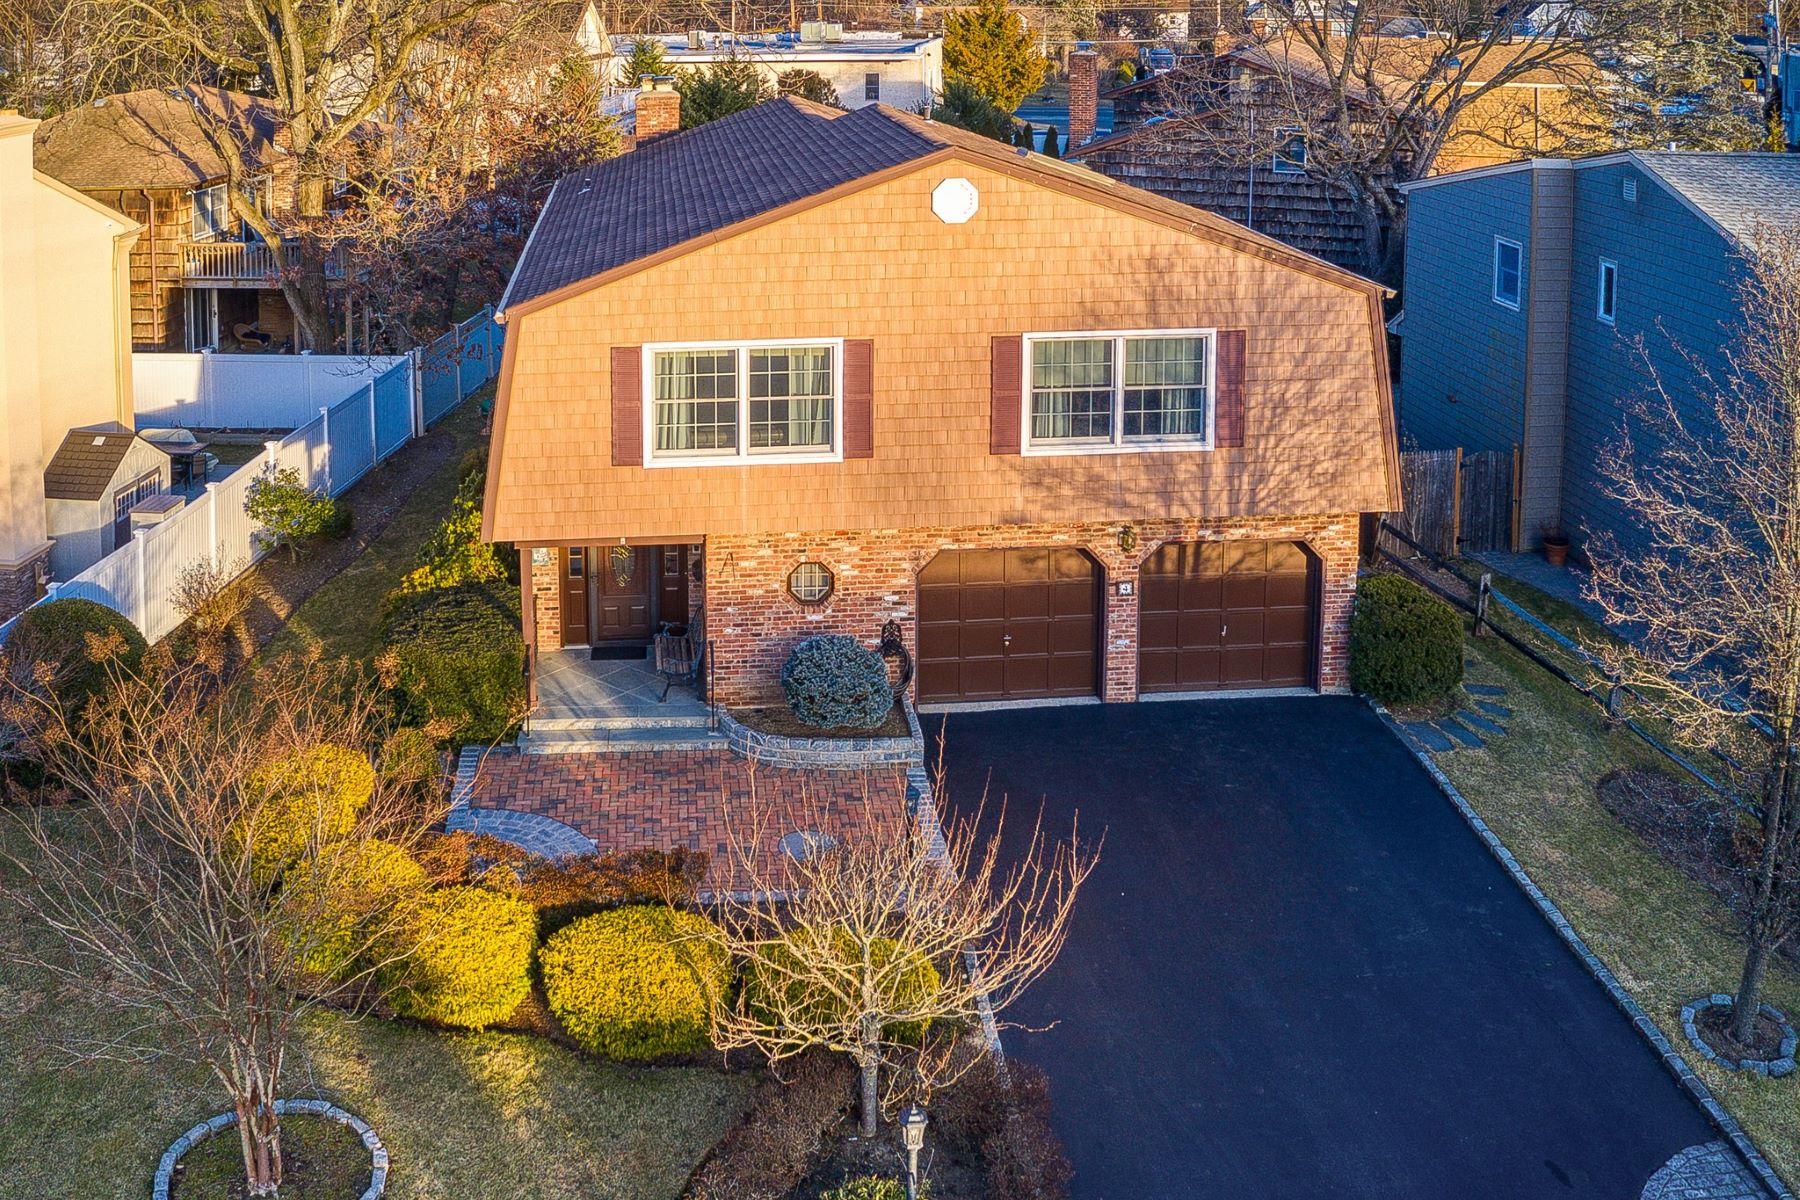 Single Family Homes for Sale at Glen Head 4 Old Farm Court Glen Head, New York 11545 United States